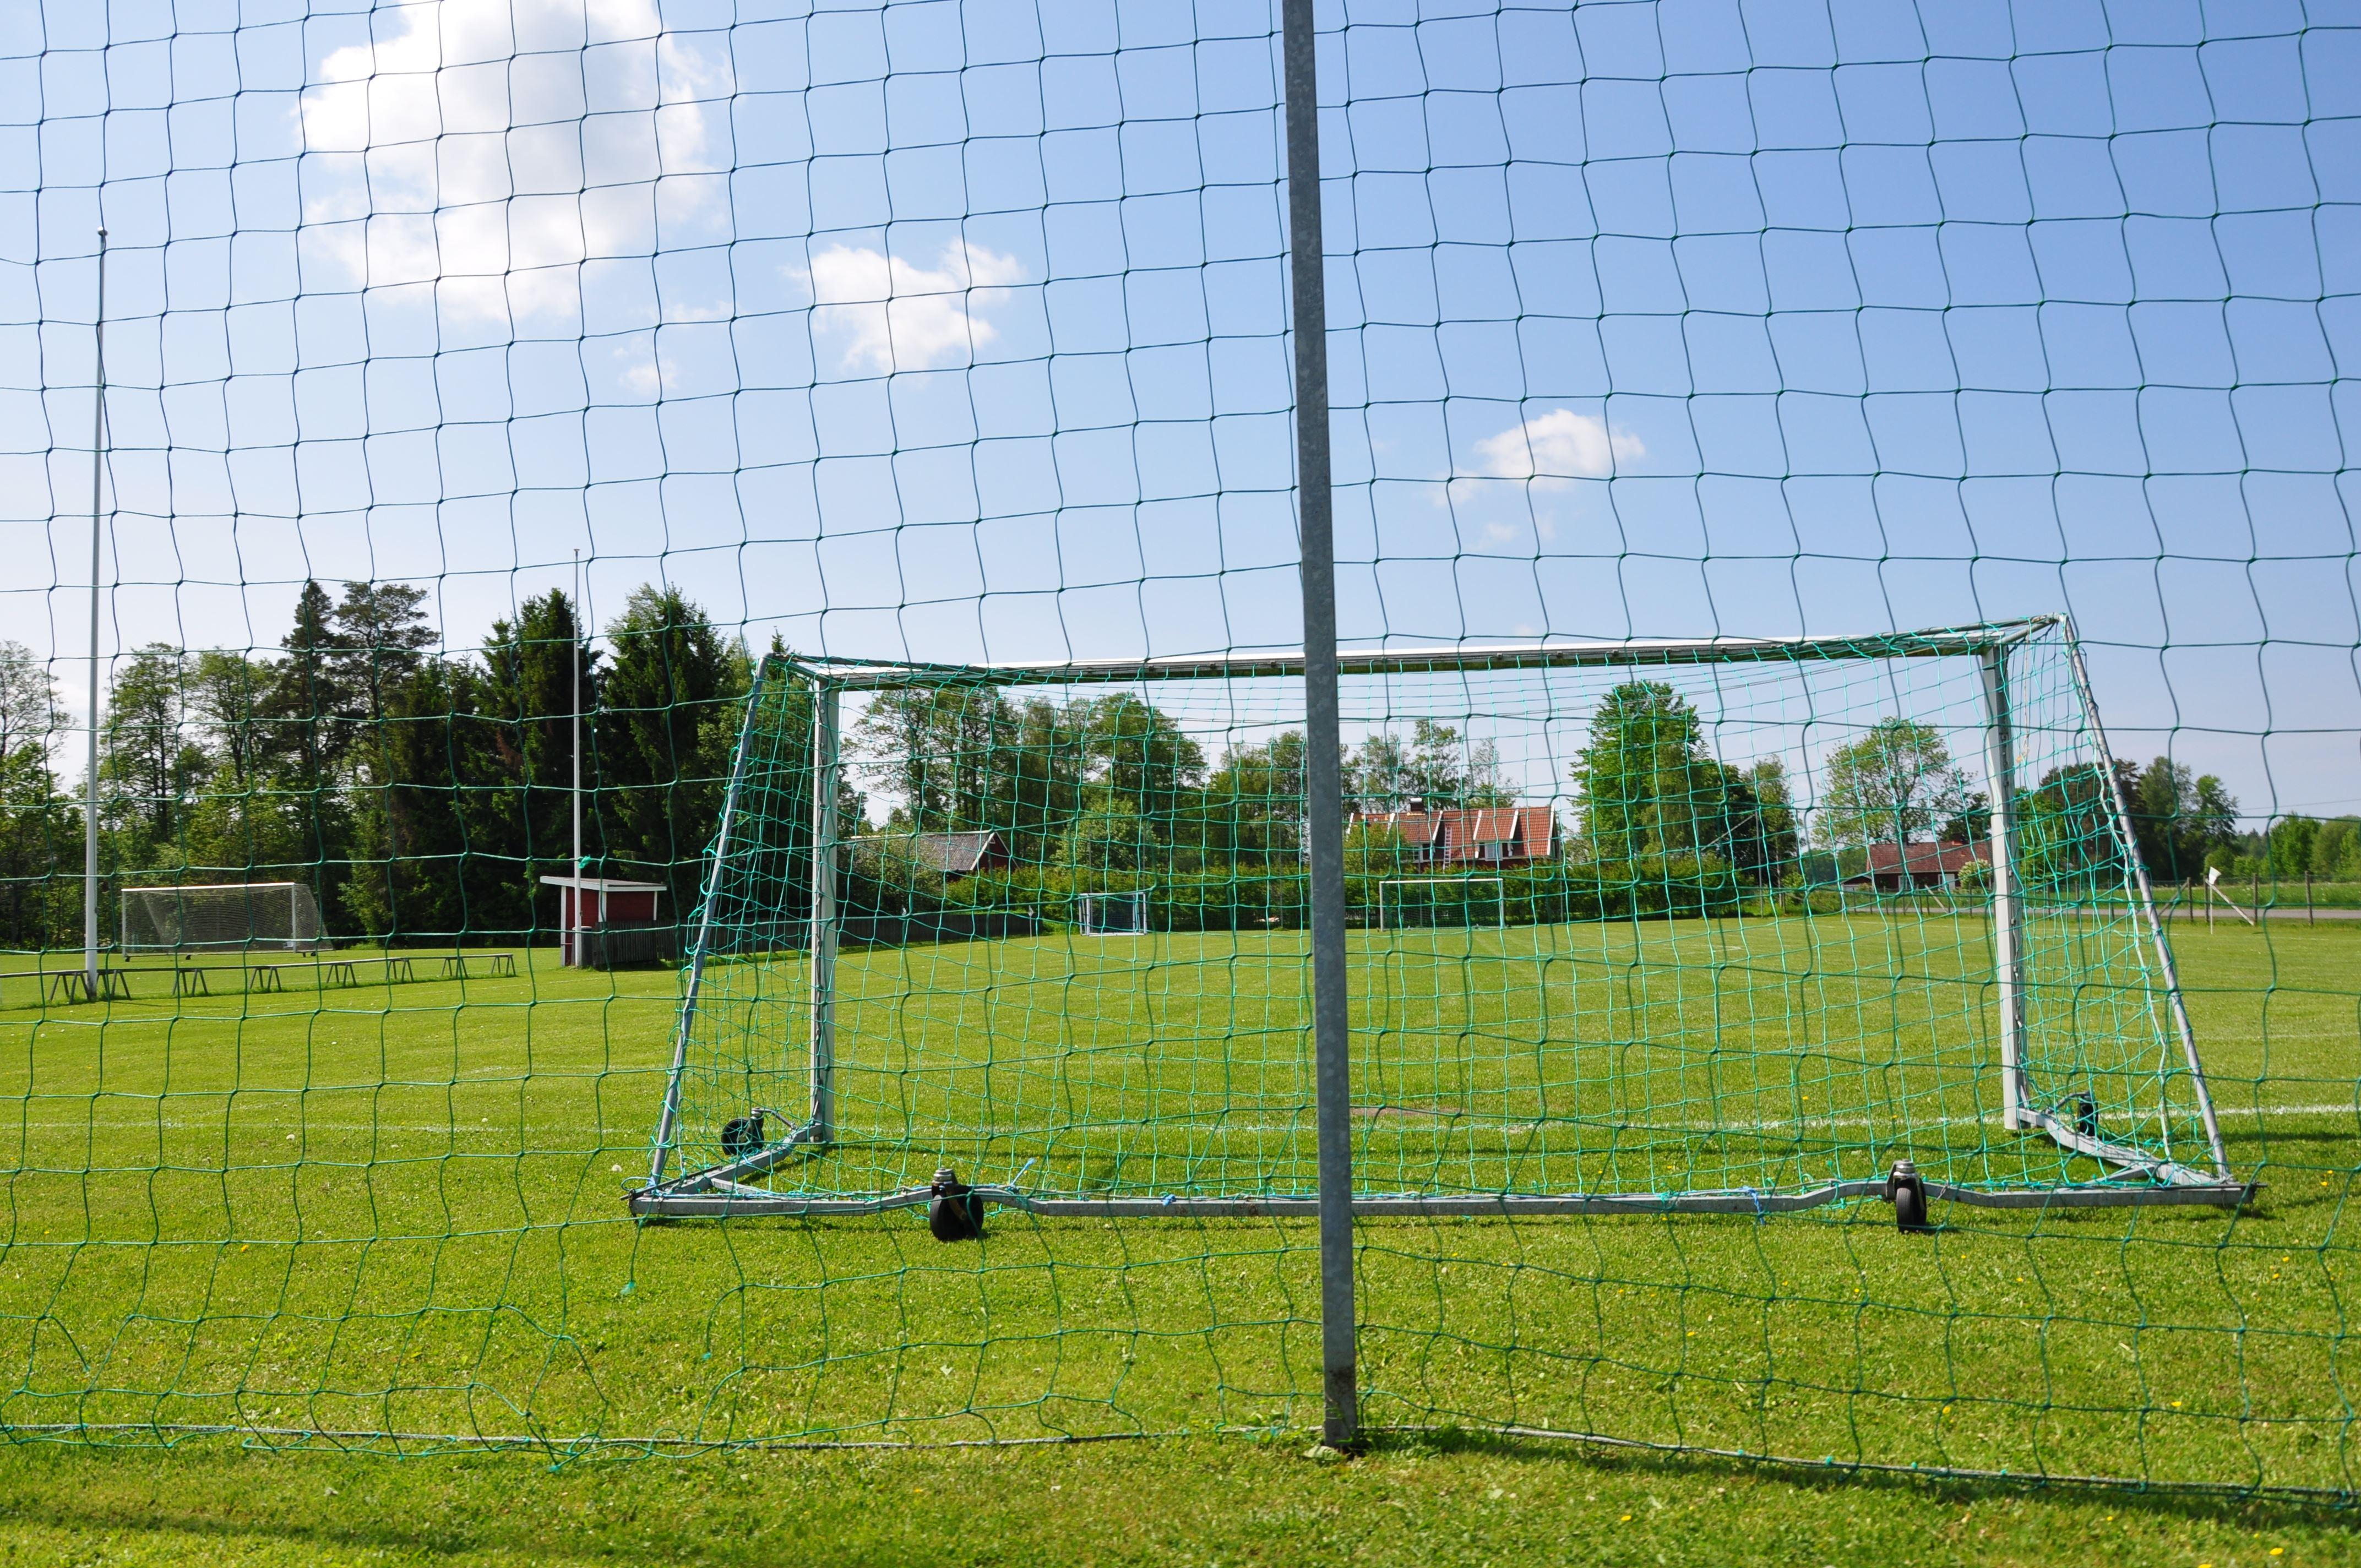 Sports ground, Björkövallen, Pjätteryd